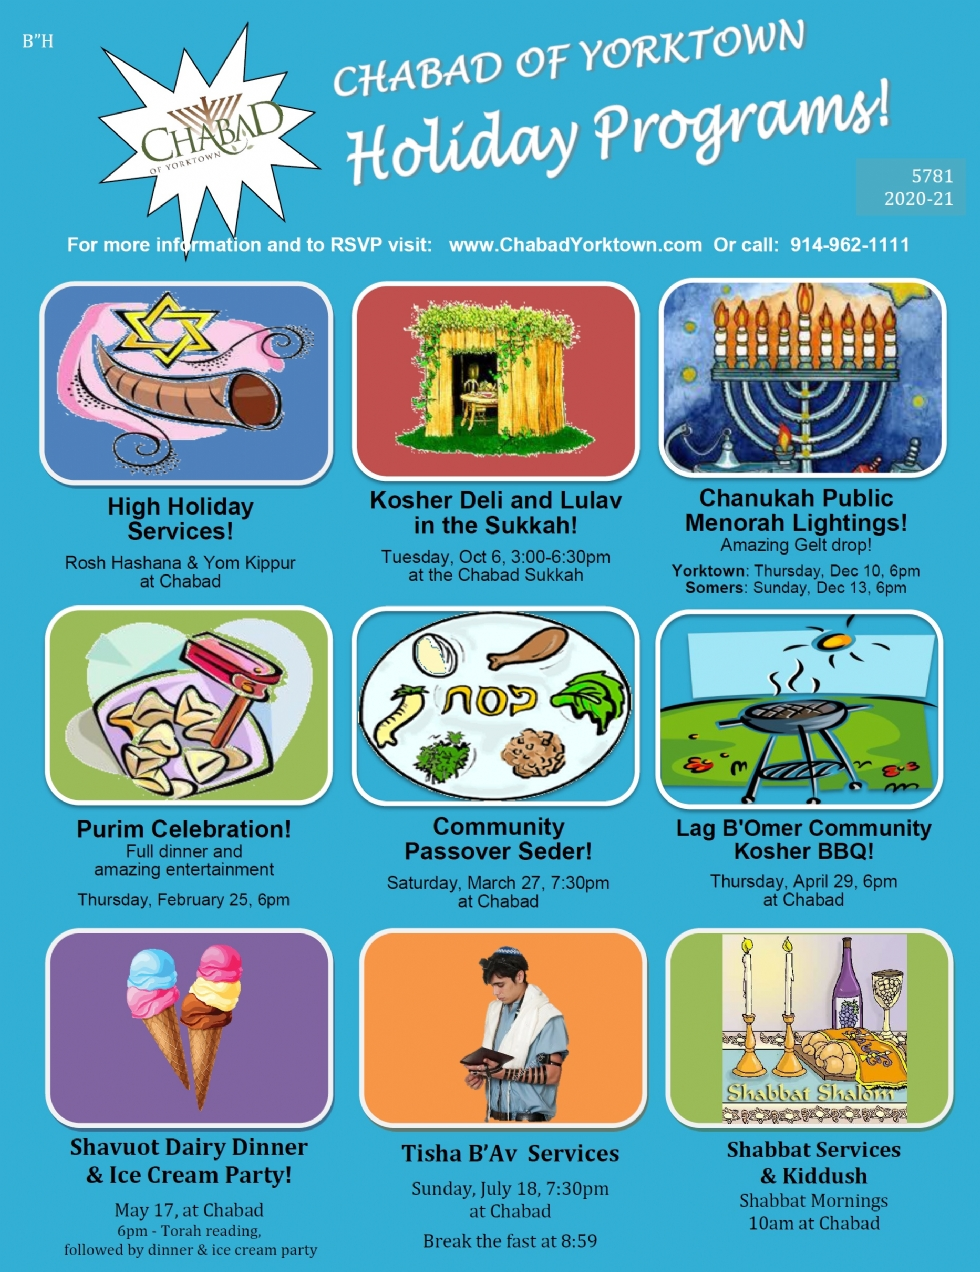 Chabad holiday program calendar 5781.jpg